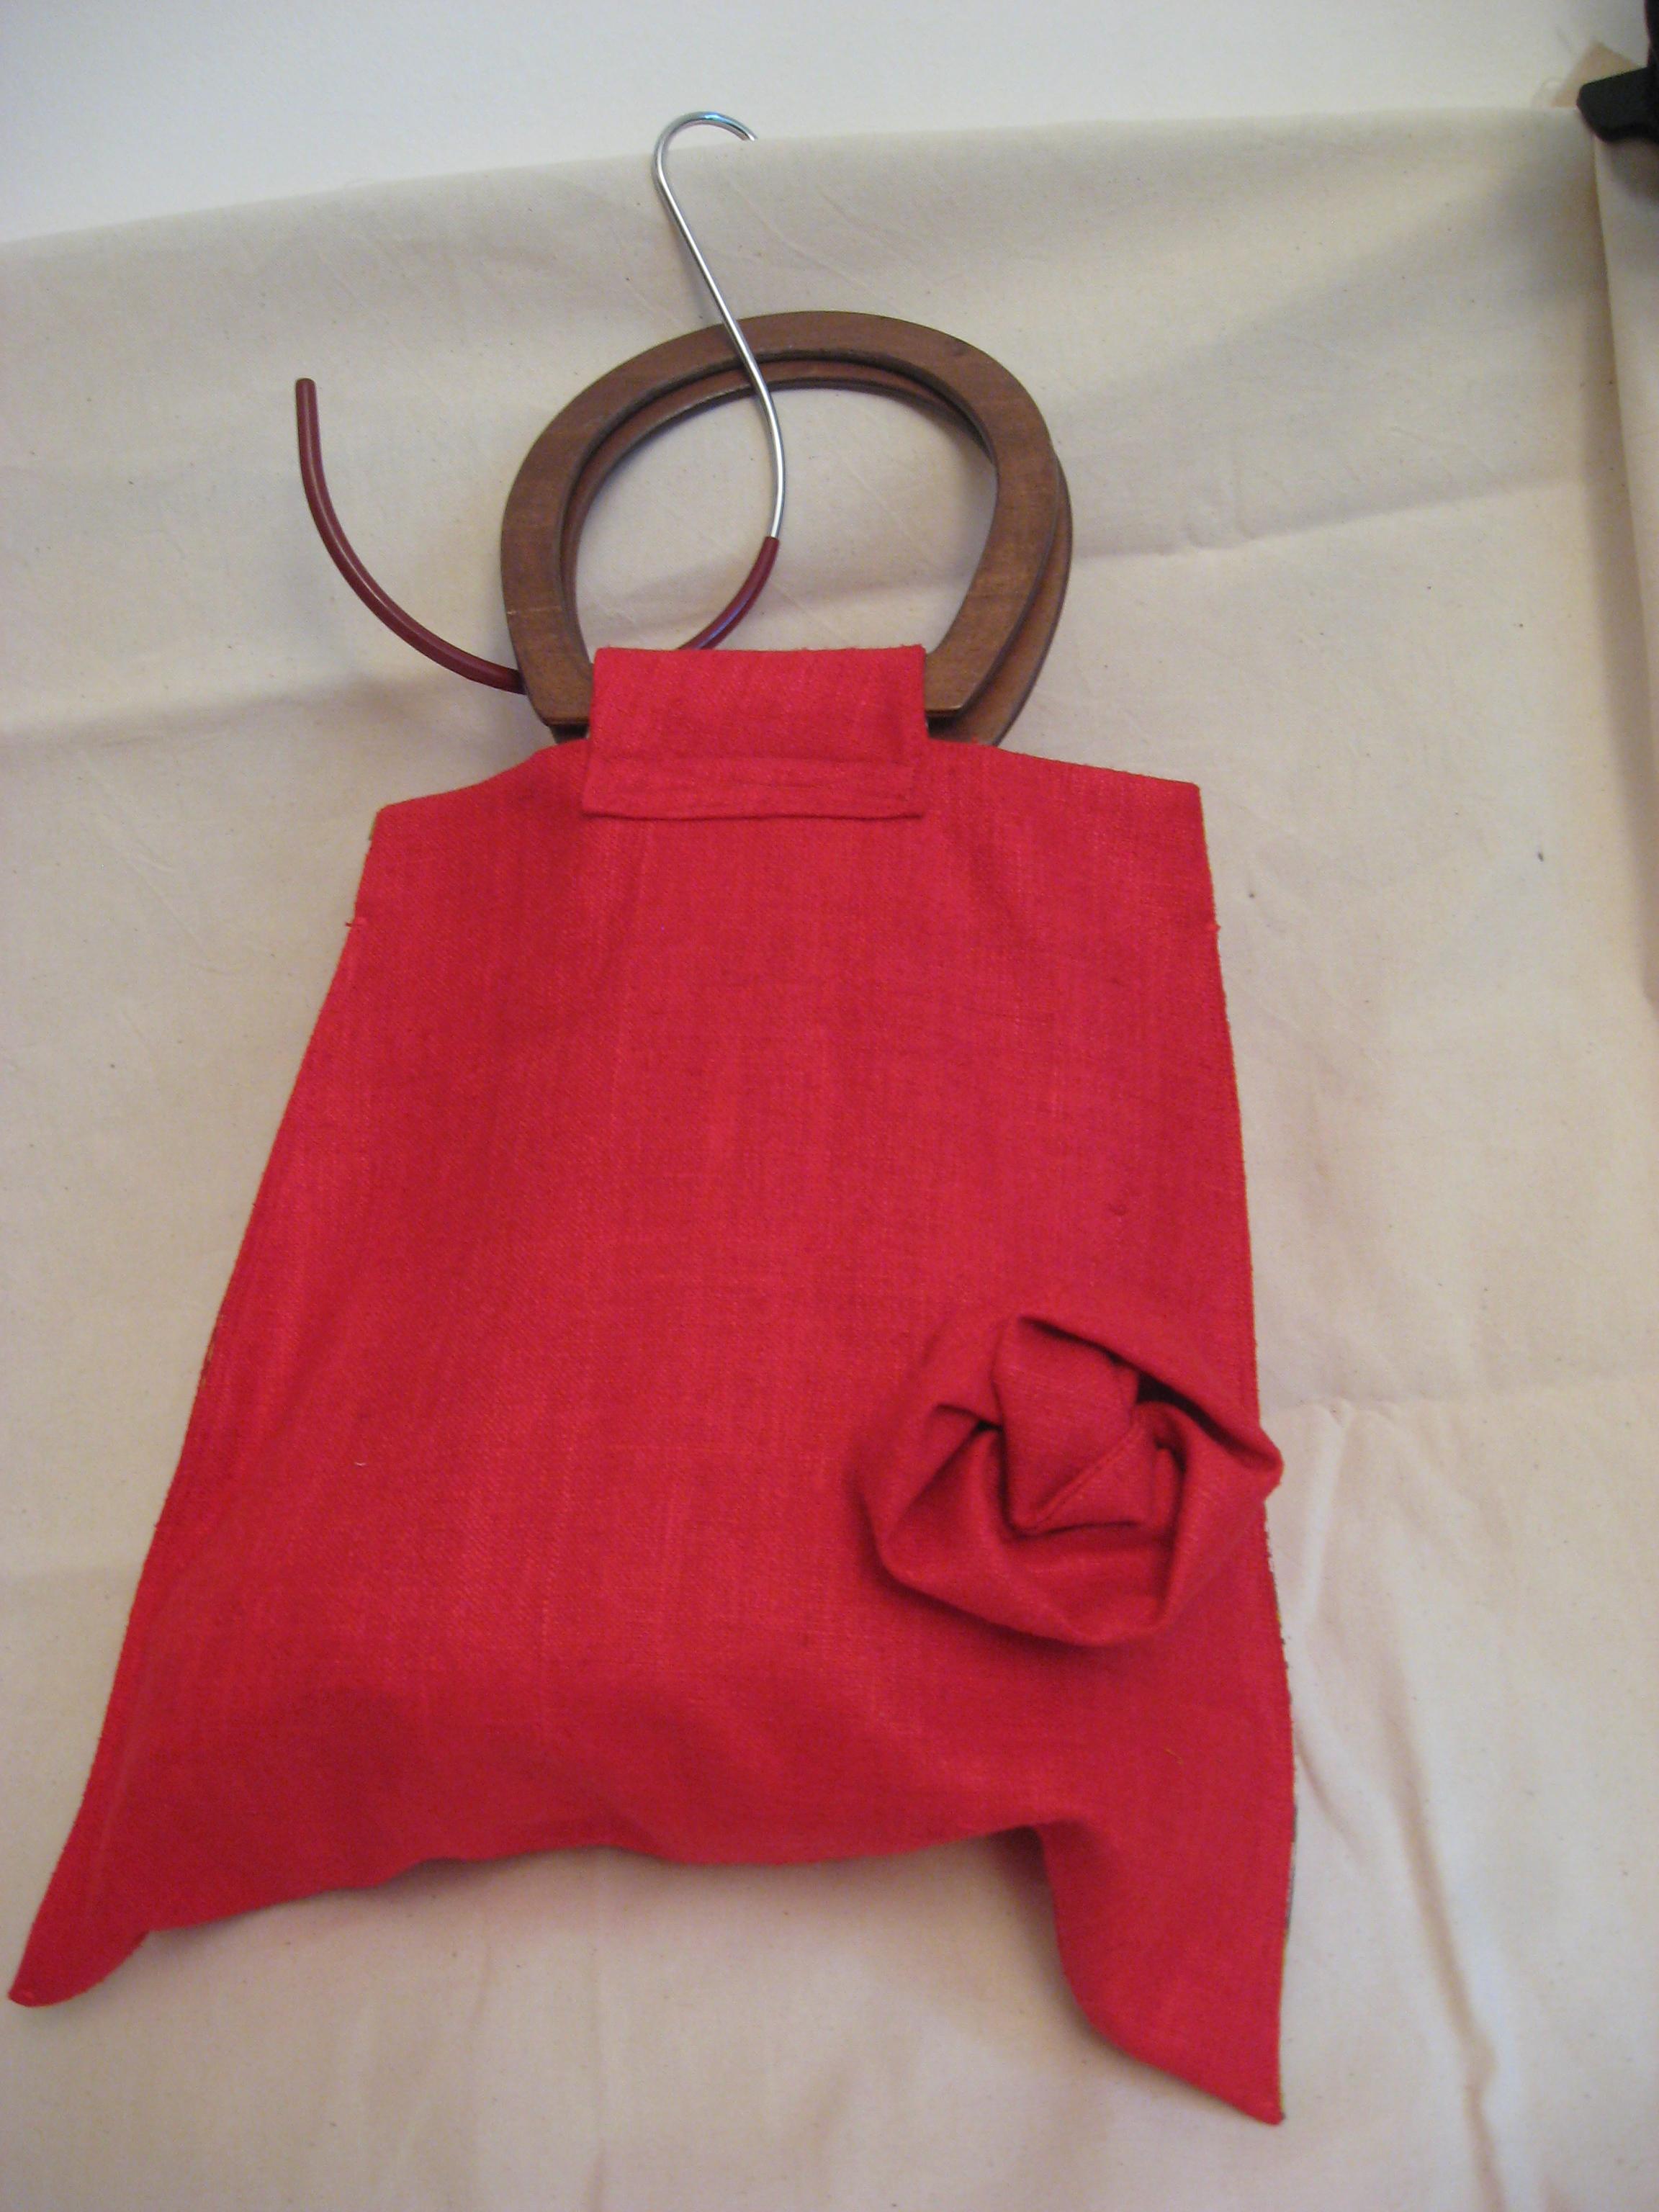 borse handmade da TEkoa Milano